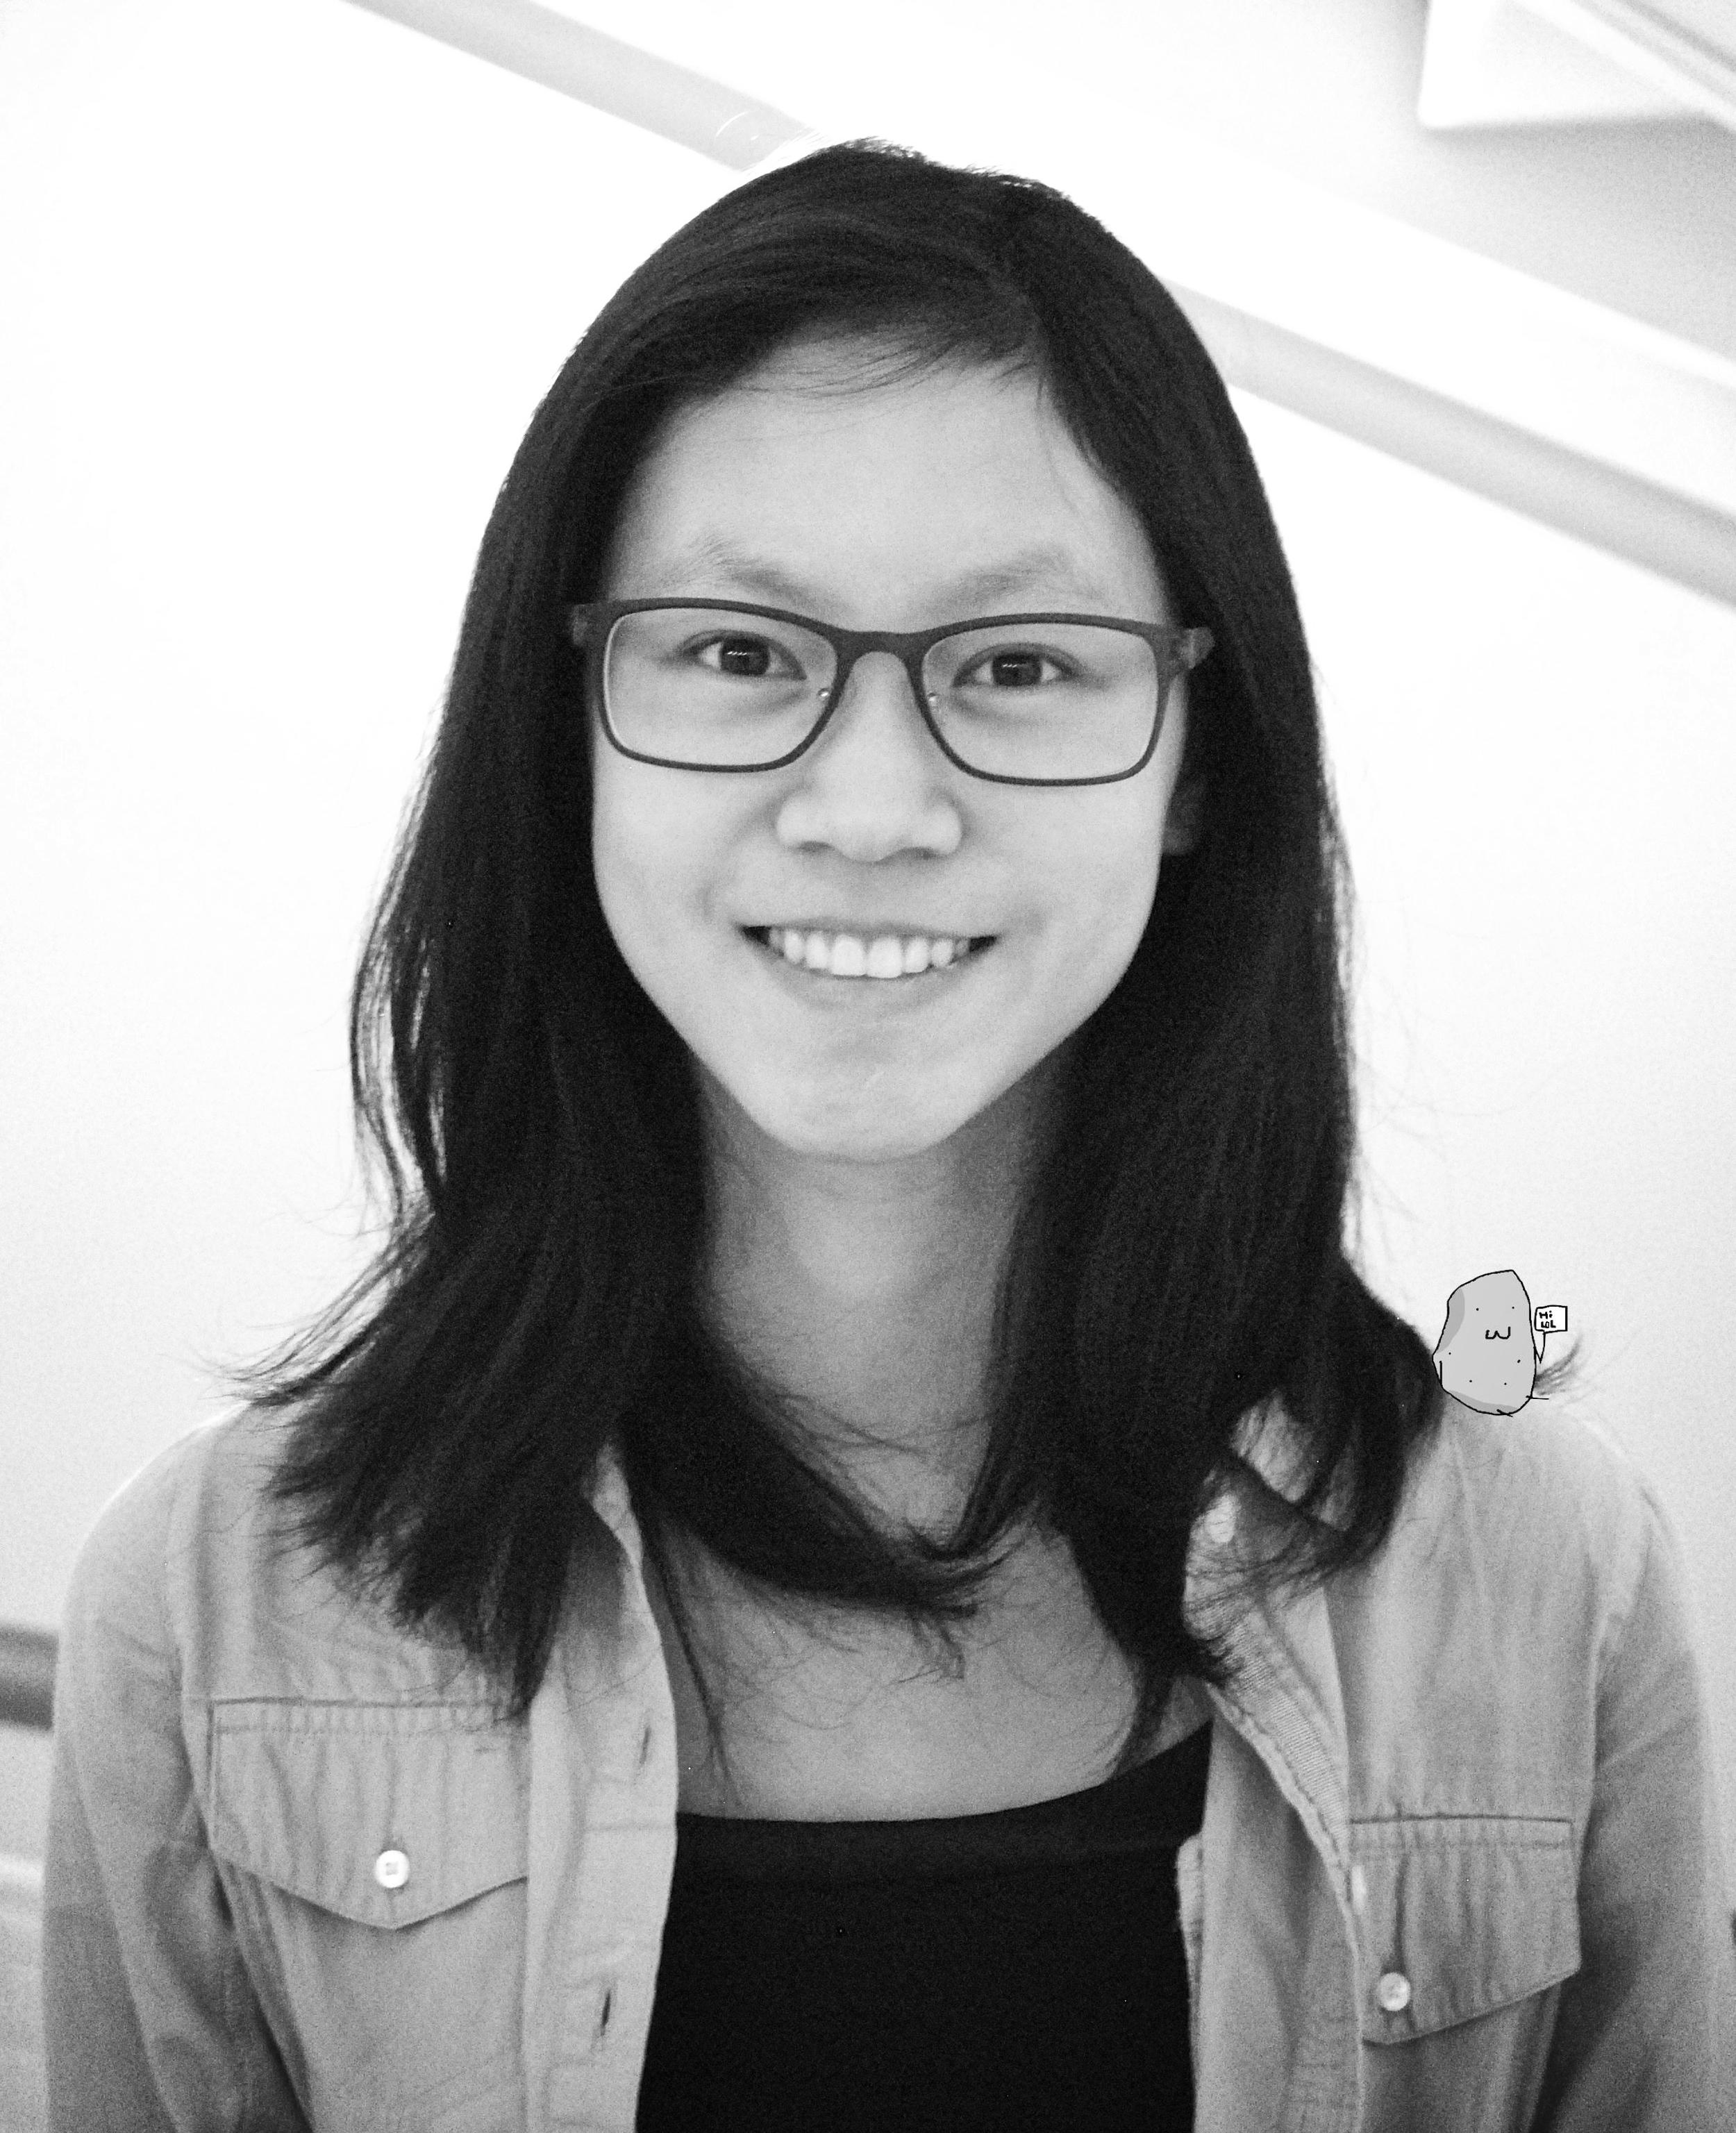 kimberly hoi     graduate student, bms program